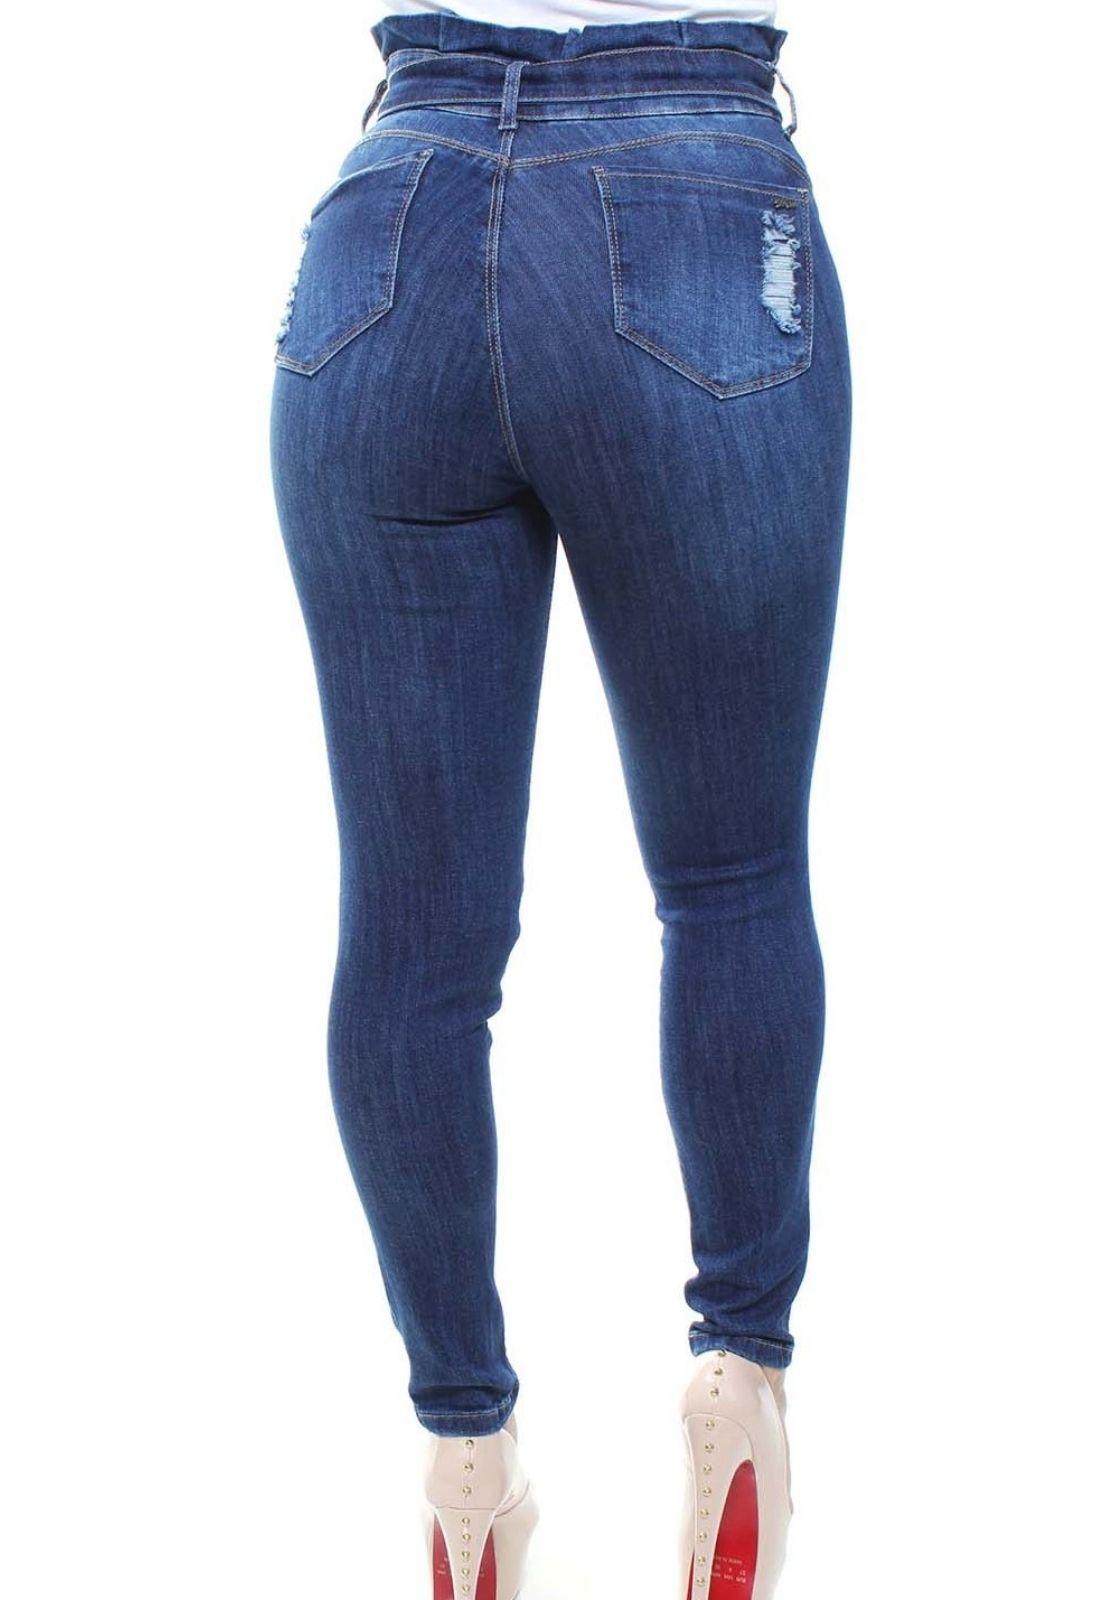 Calça Jeans Feminina Clochard Skinny Crocker - 47547  - CROCKER JEANS